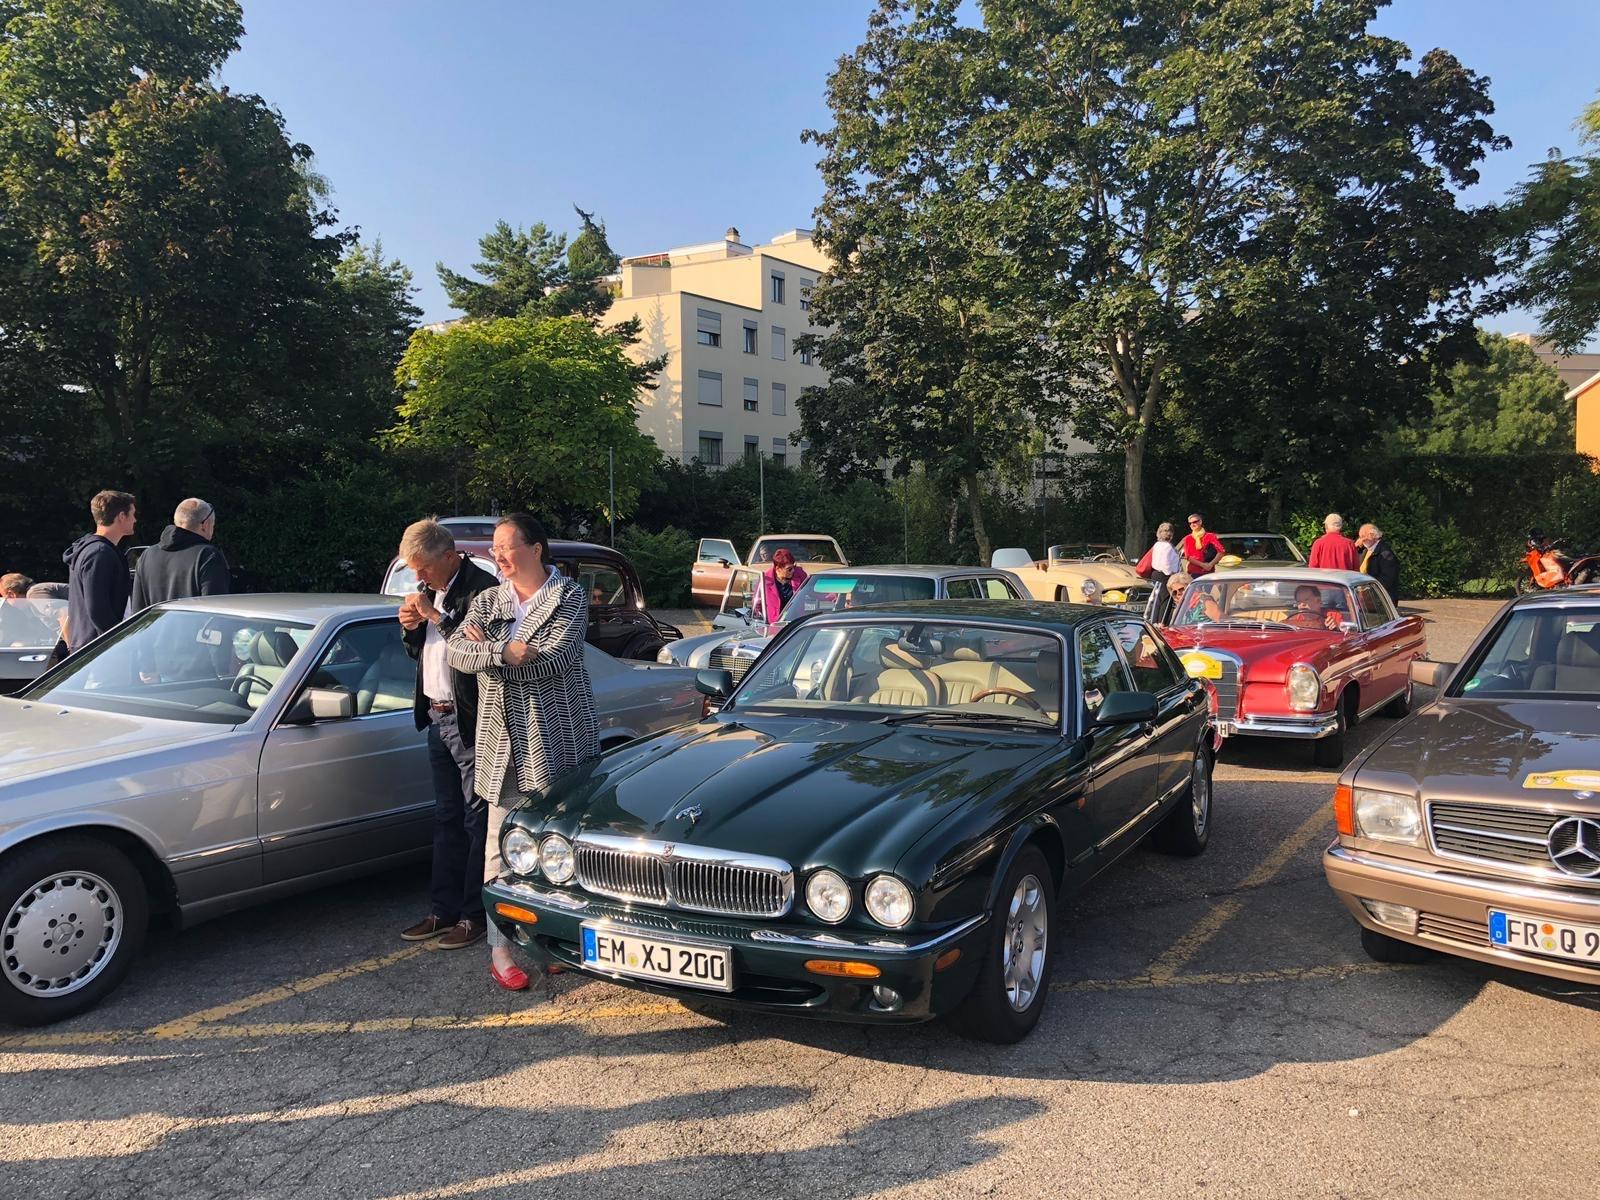 Lions Classic Jaguar XJ